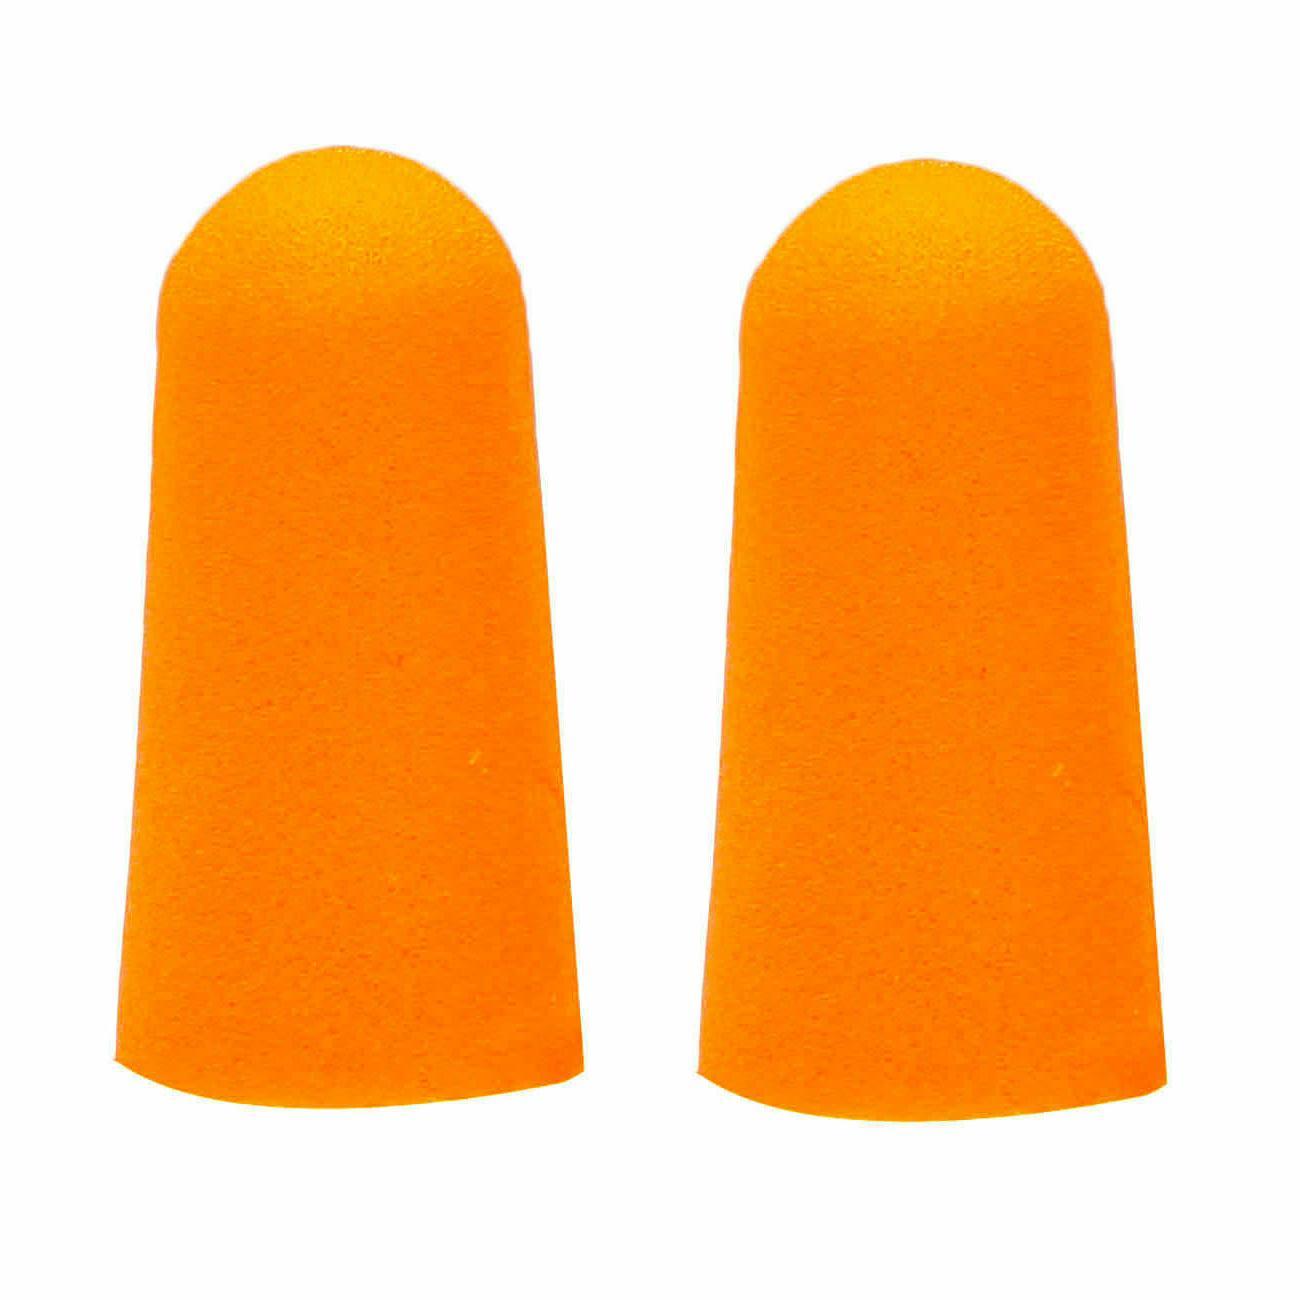 EarPlugs 50 Pair Soft NRR 32DB Noise